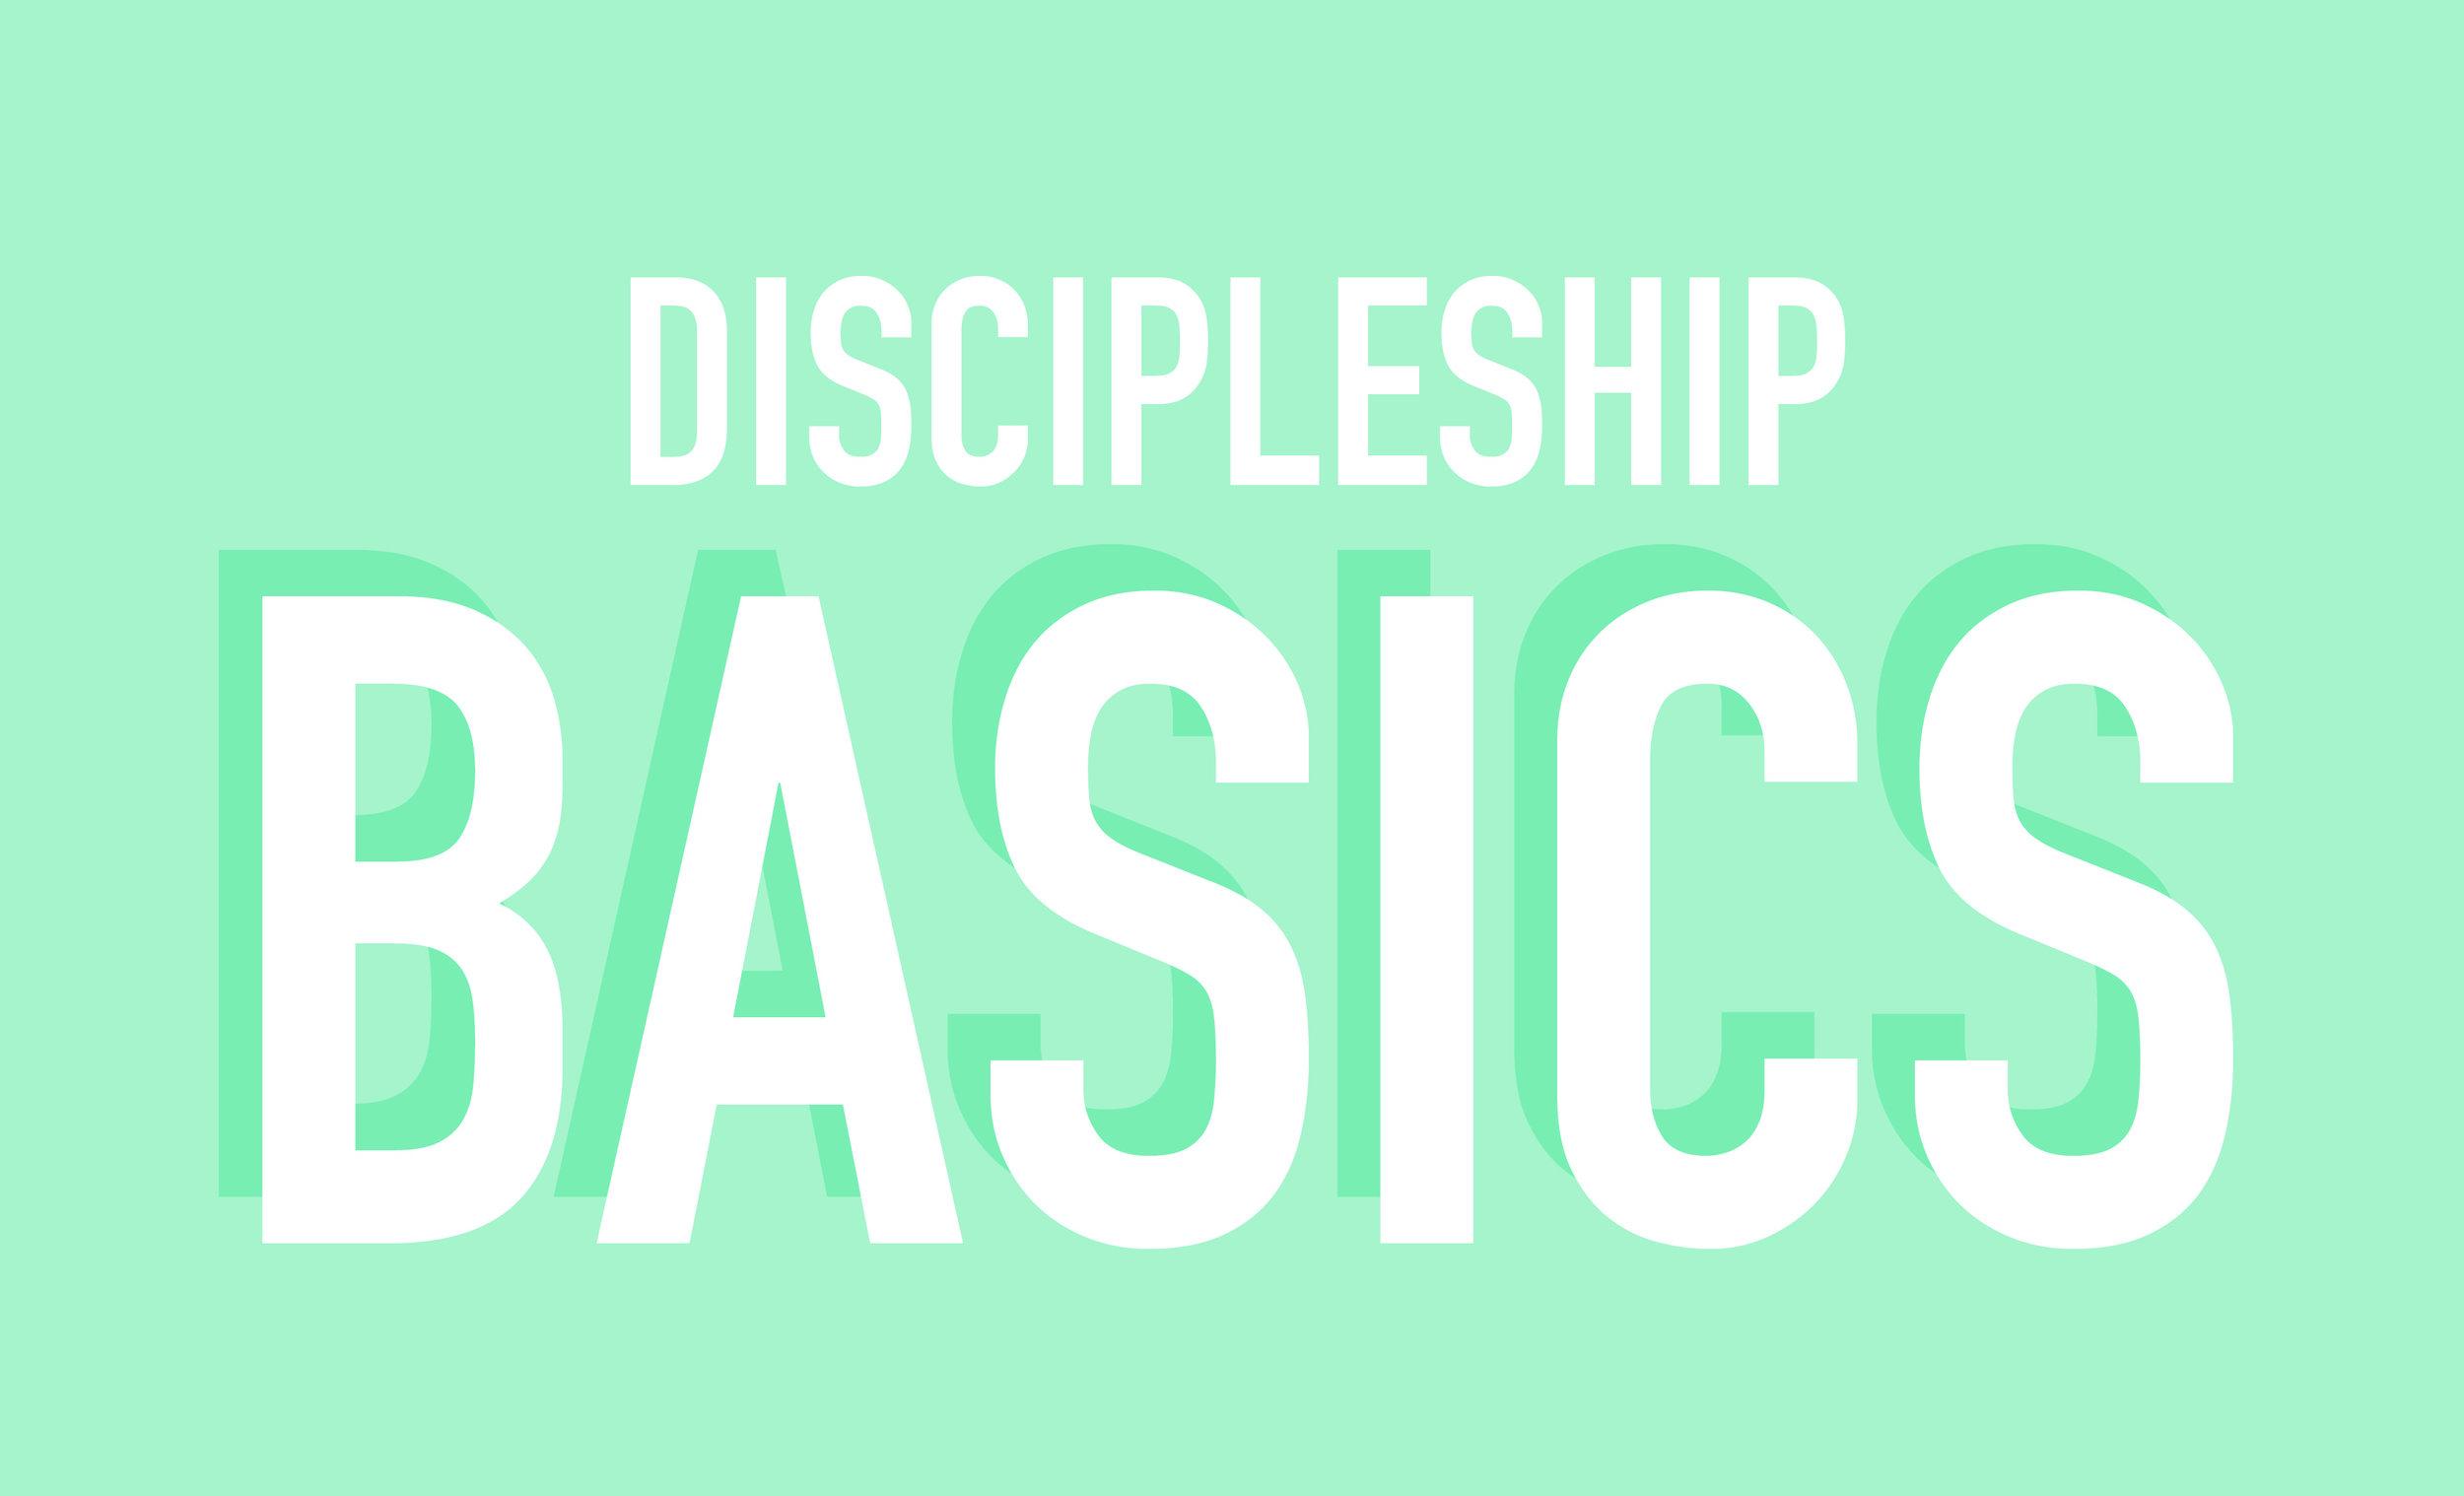 discipleship basics